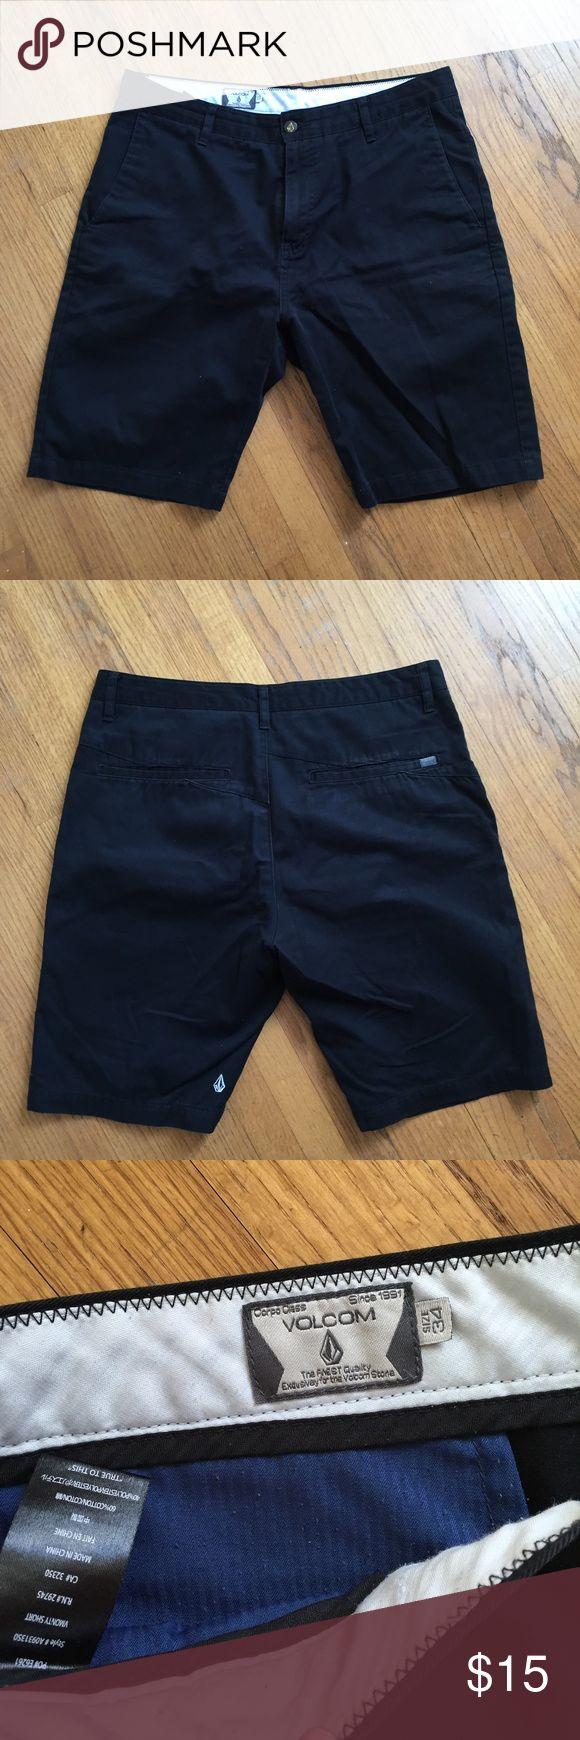 Men's black Volcom Shorts size 34 Men's Black Volcom Shorts in size 34. Excellent used condition! Volcom Shorts